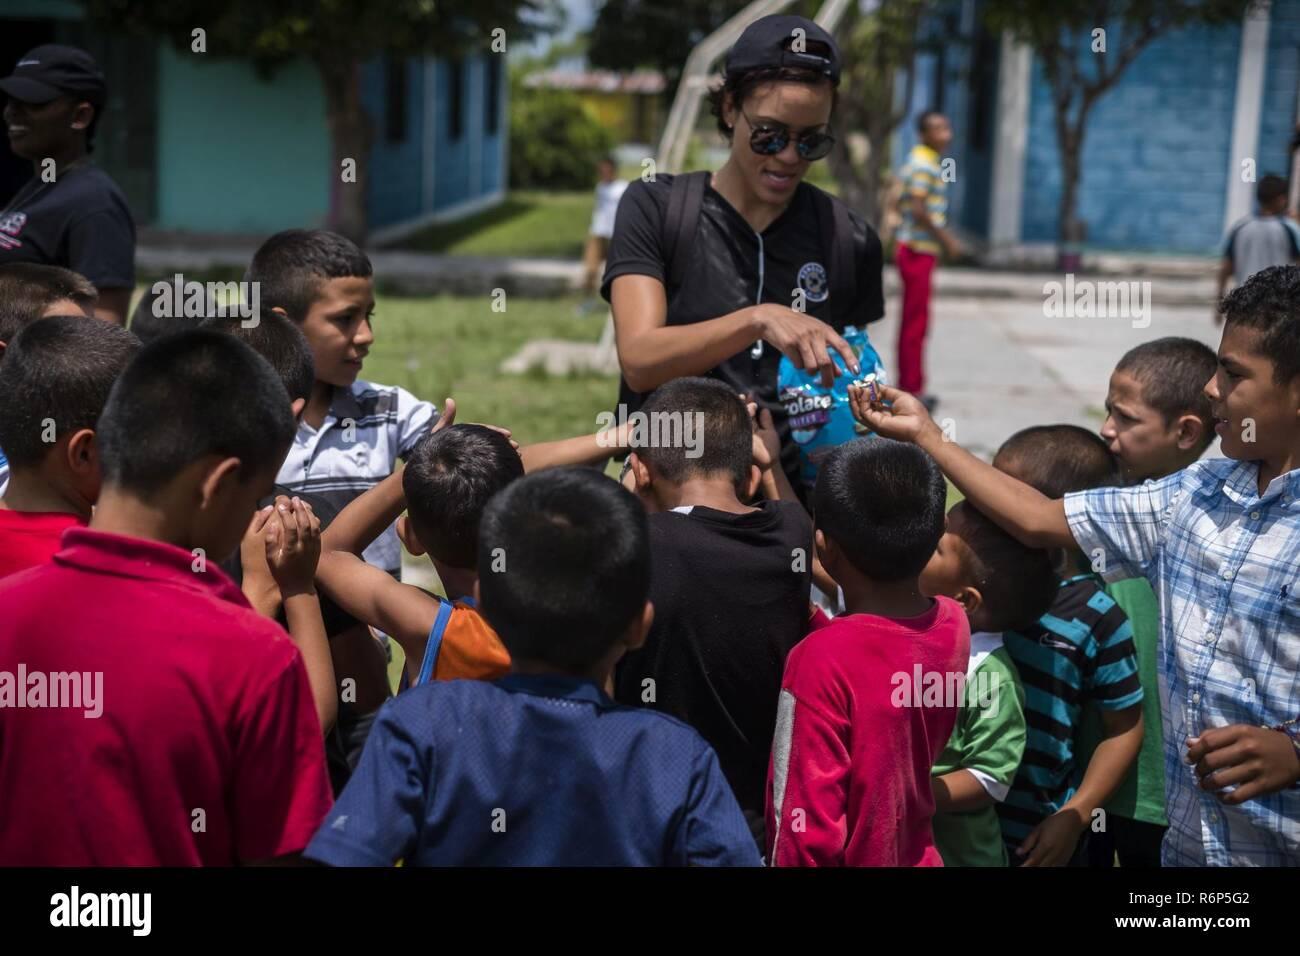 Soldiers and Airman from Joint Task Force - Bravo visit the orphange of San Antonio de Padua Ninos in La Paz, Honduras, May 13, 2017. Stock Photo